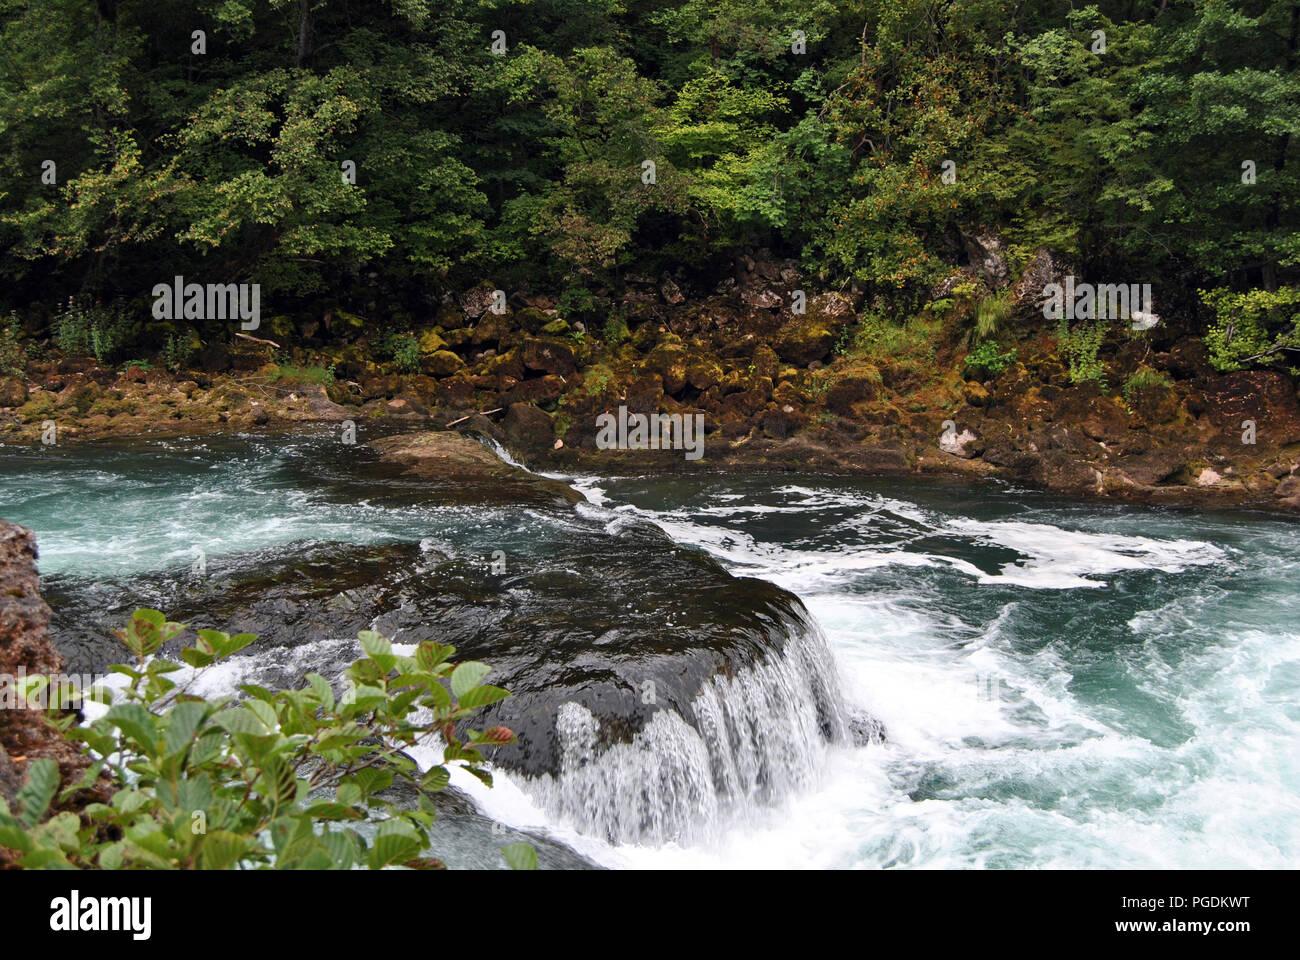 Waterfalls in the Una National Park, Bosnia-Herzegovina - Stock Image